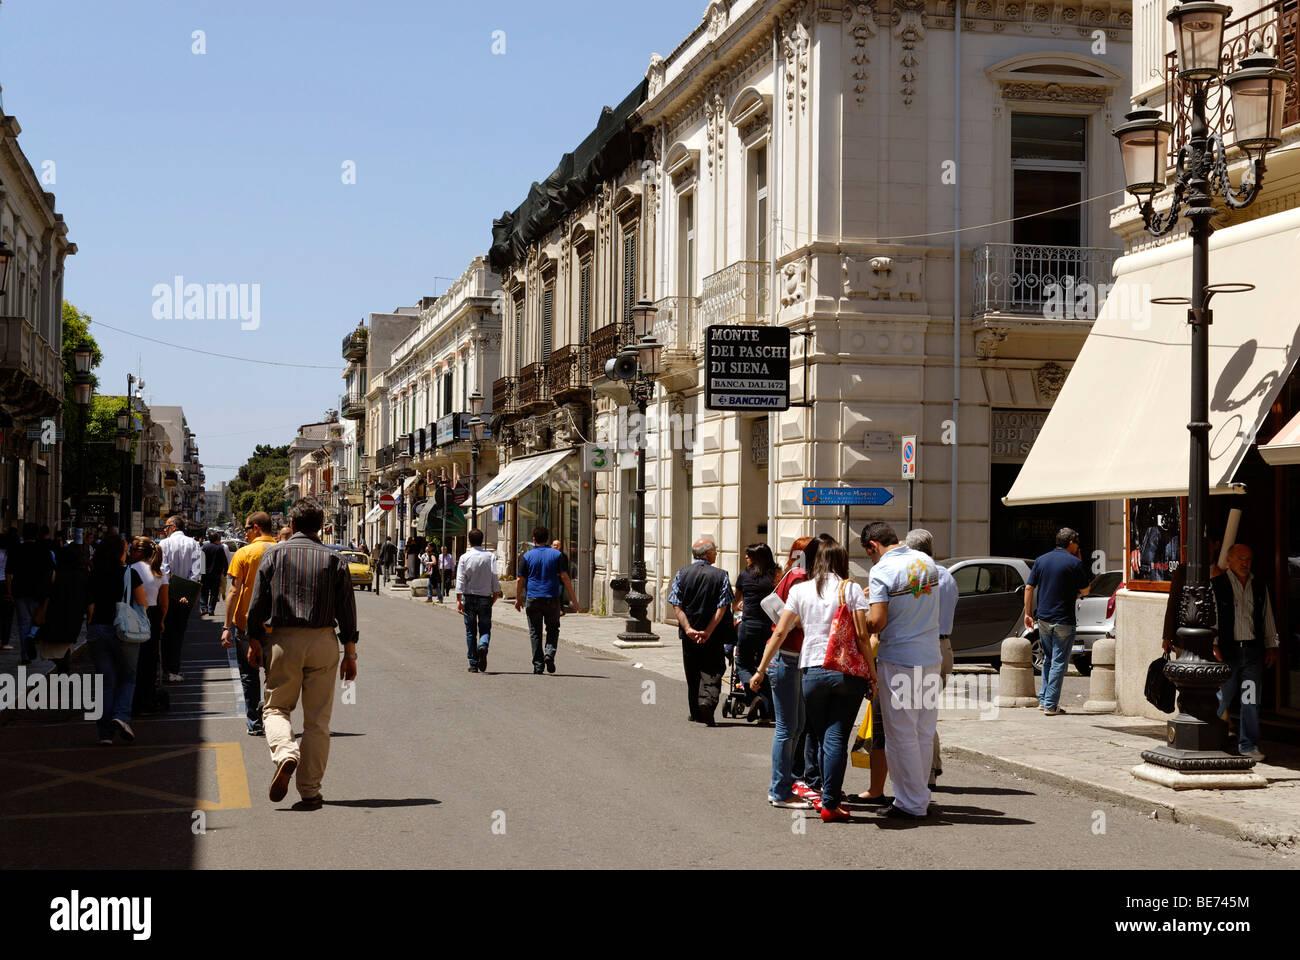 Corso Garibaldi, Reggio di Calabria, Calabria, Italy, Europe Stock Photo